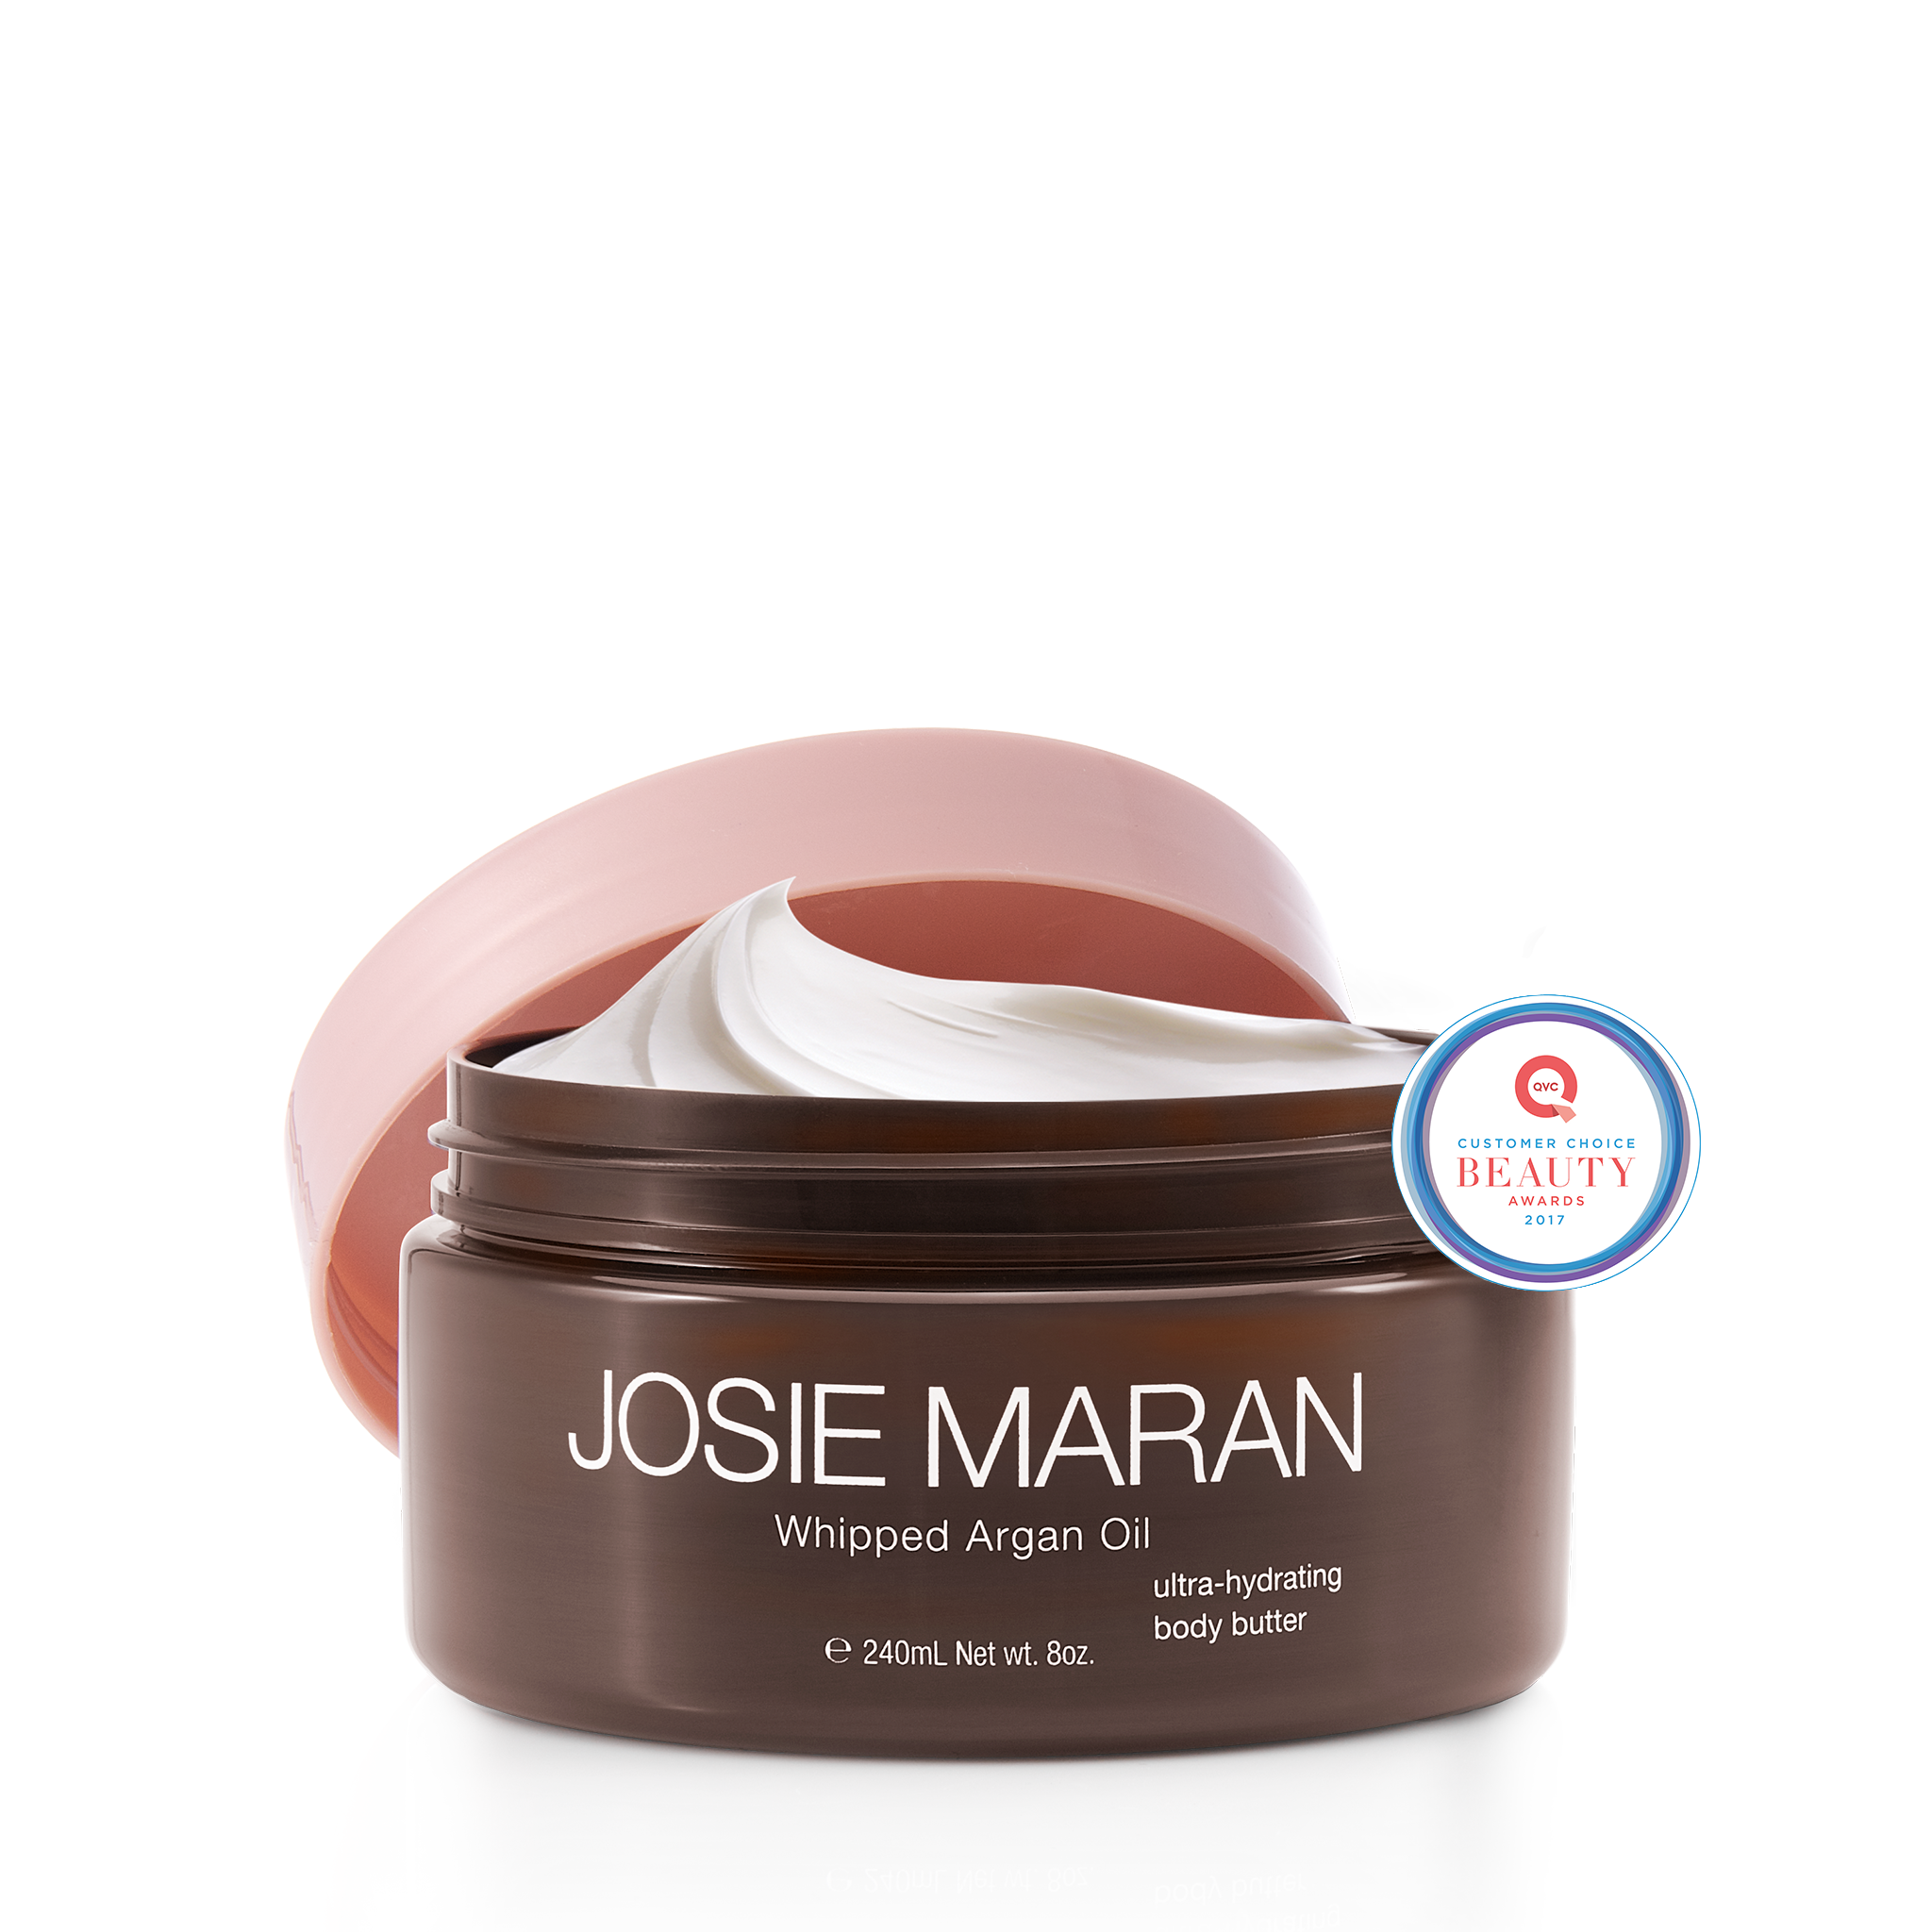 Josie Maran Whipped Argan Oil Body Butter Vanilla Apricot